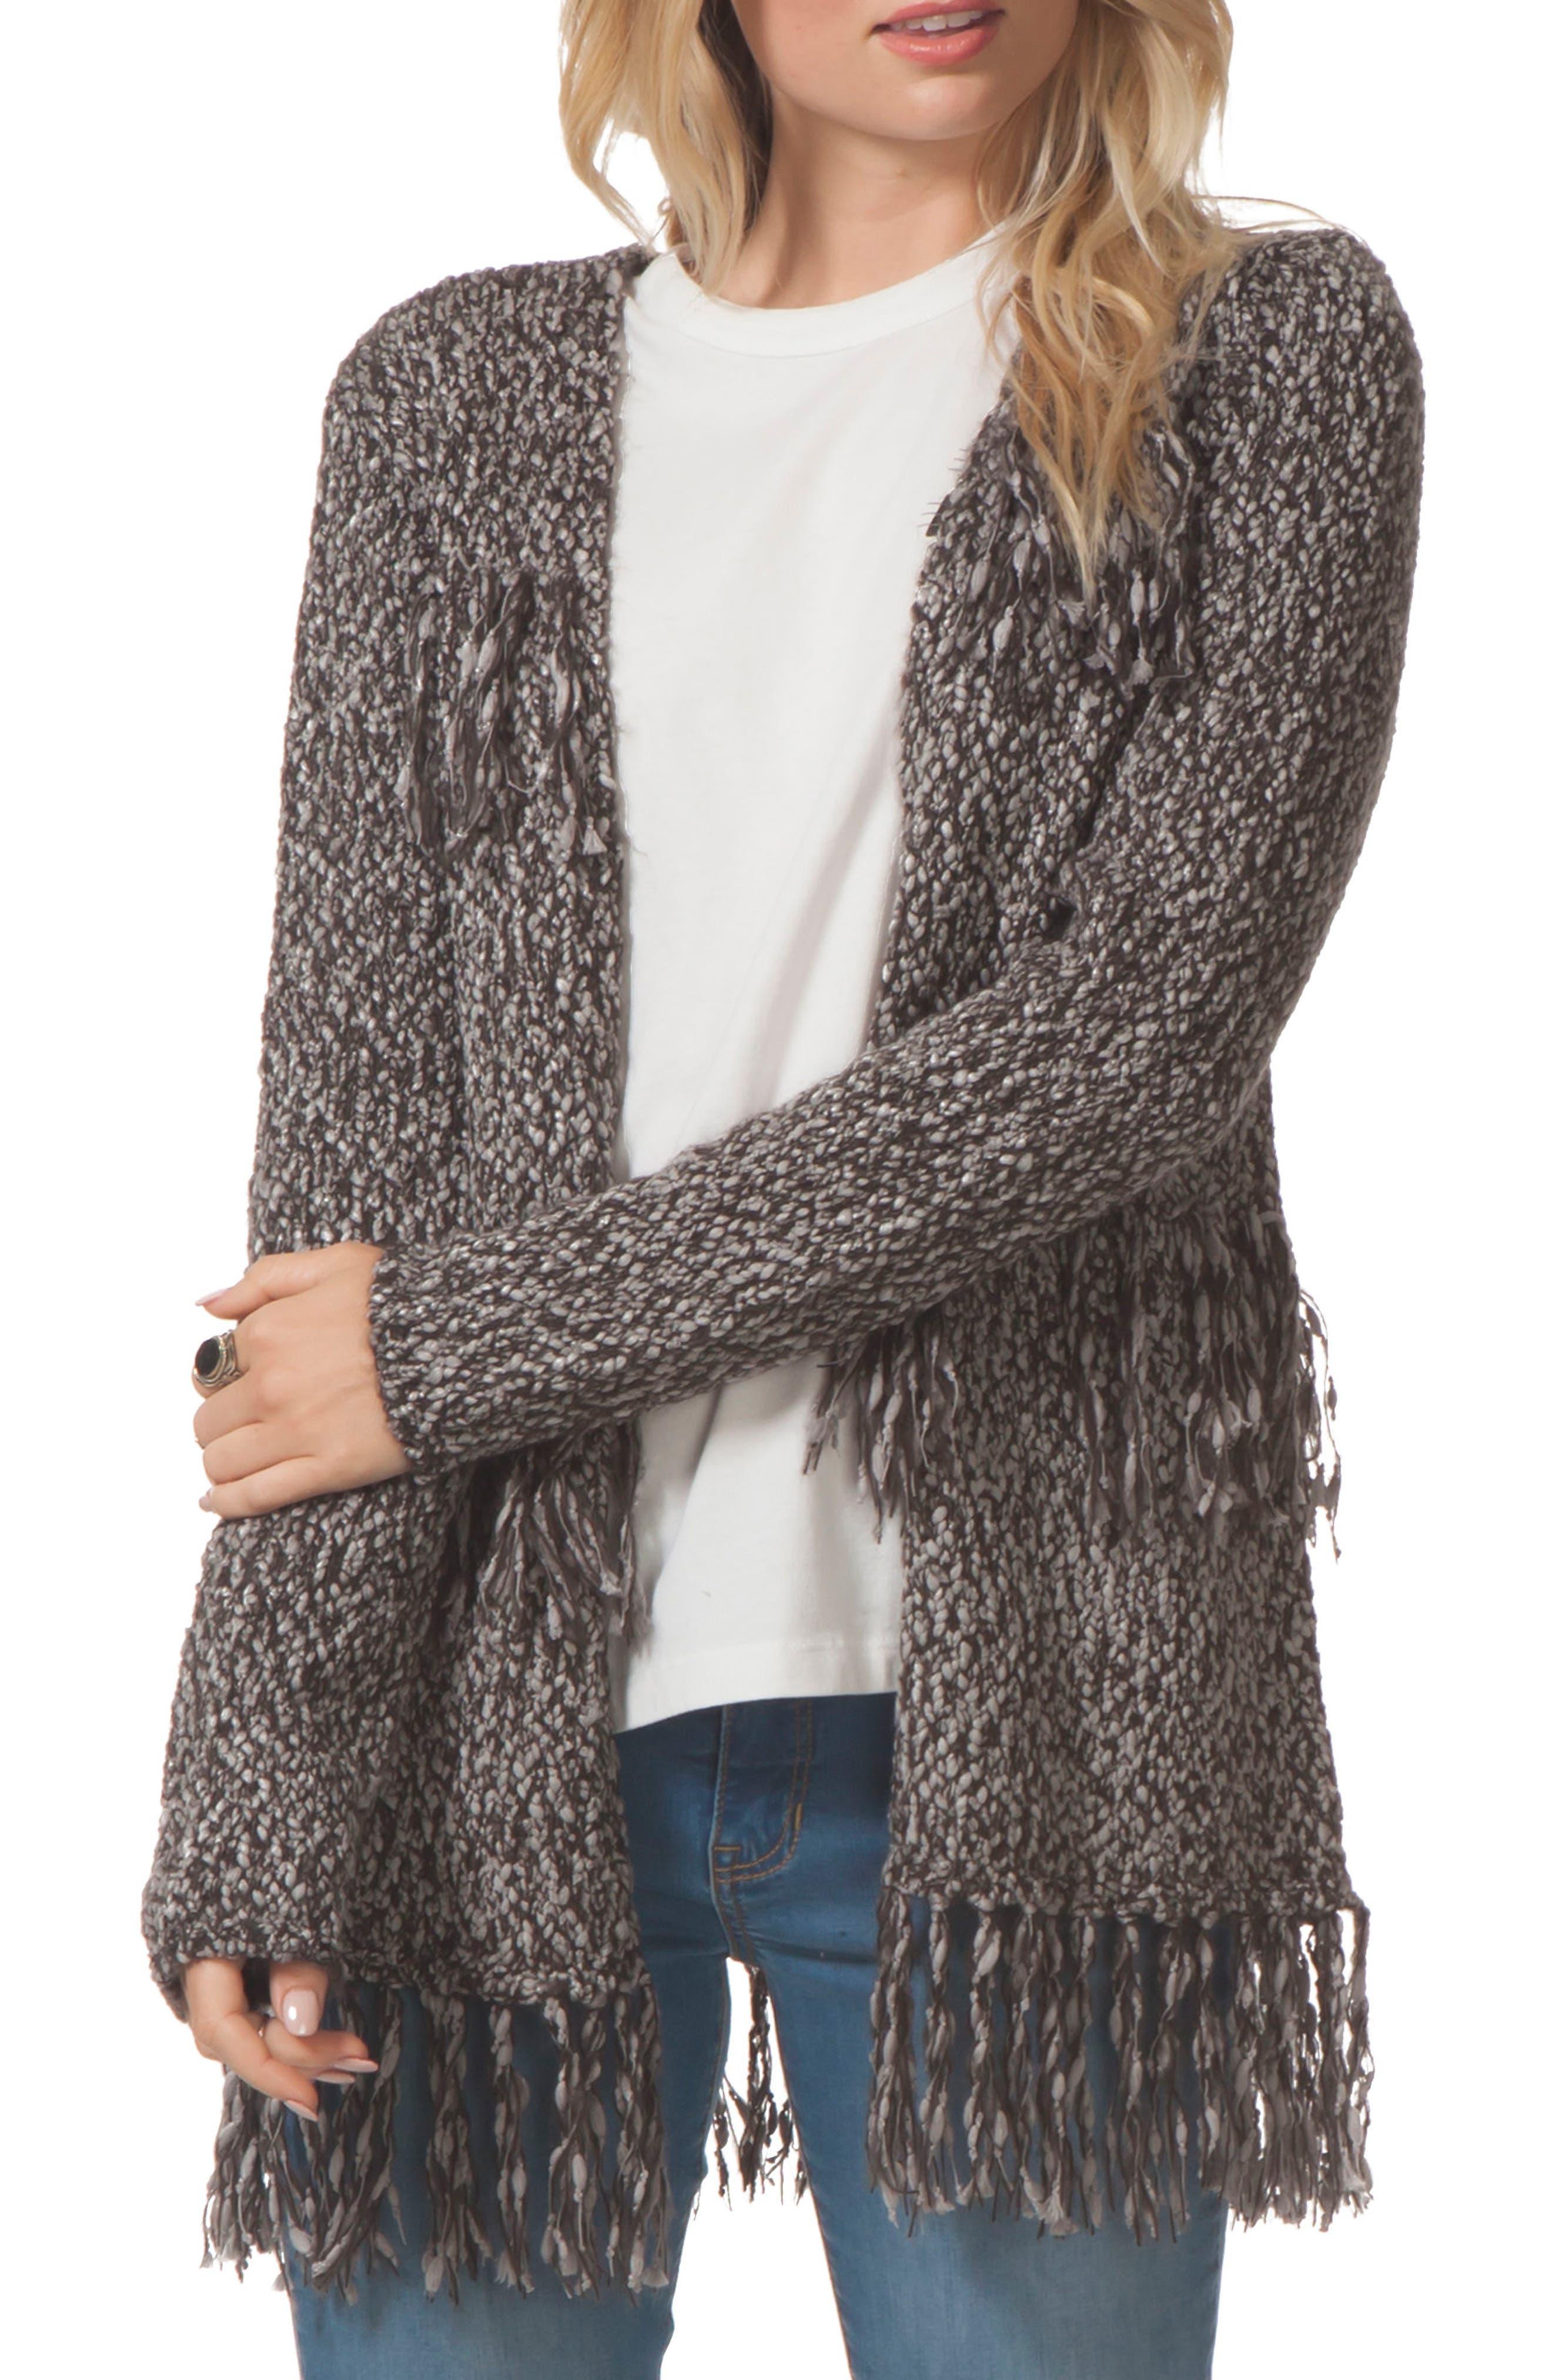 Main Image - Rip Curl Heirloom Sweater Jacket